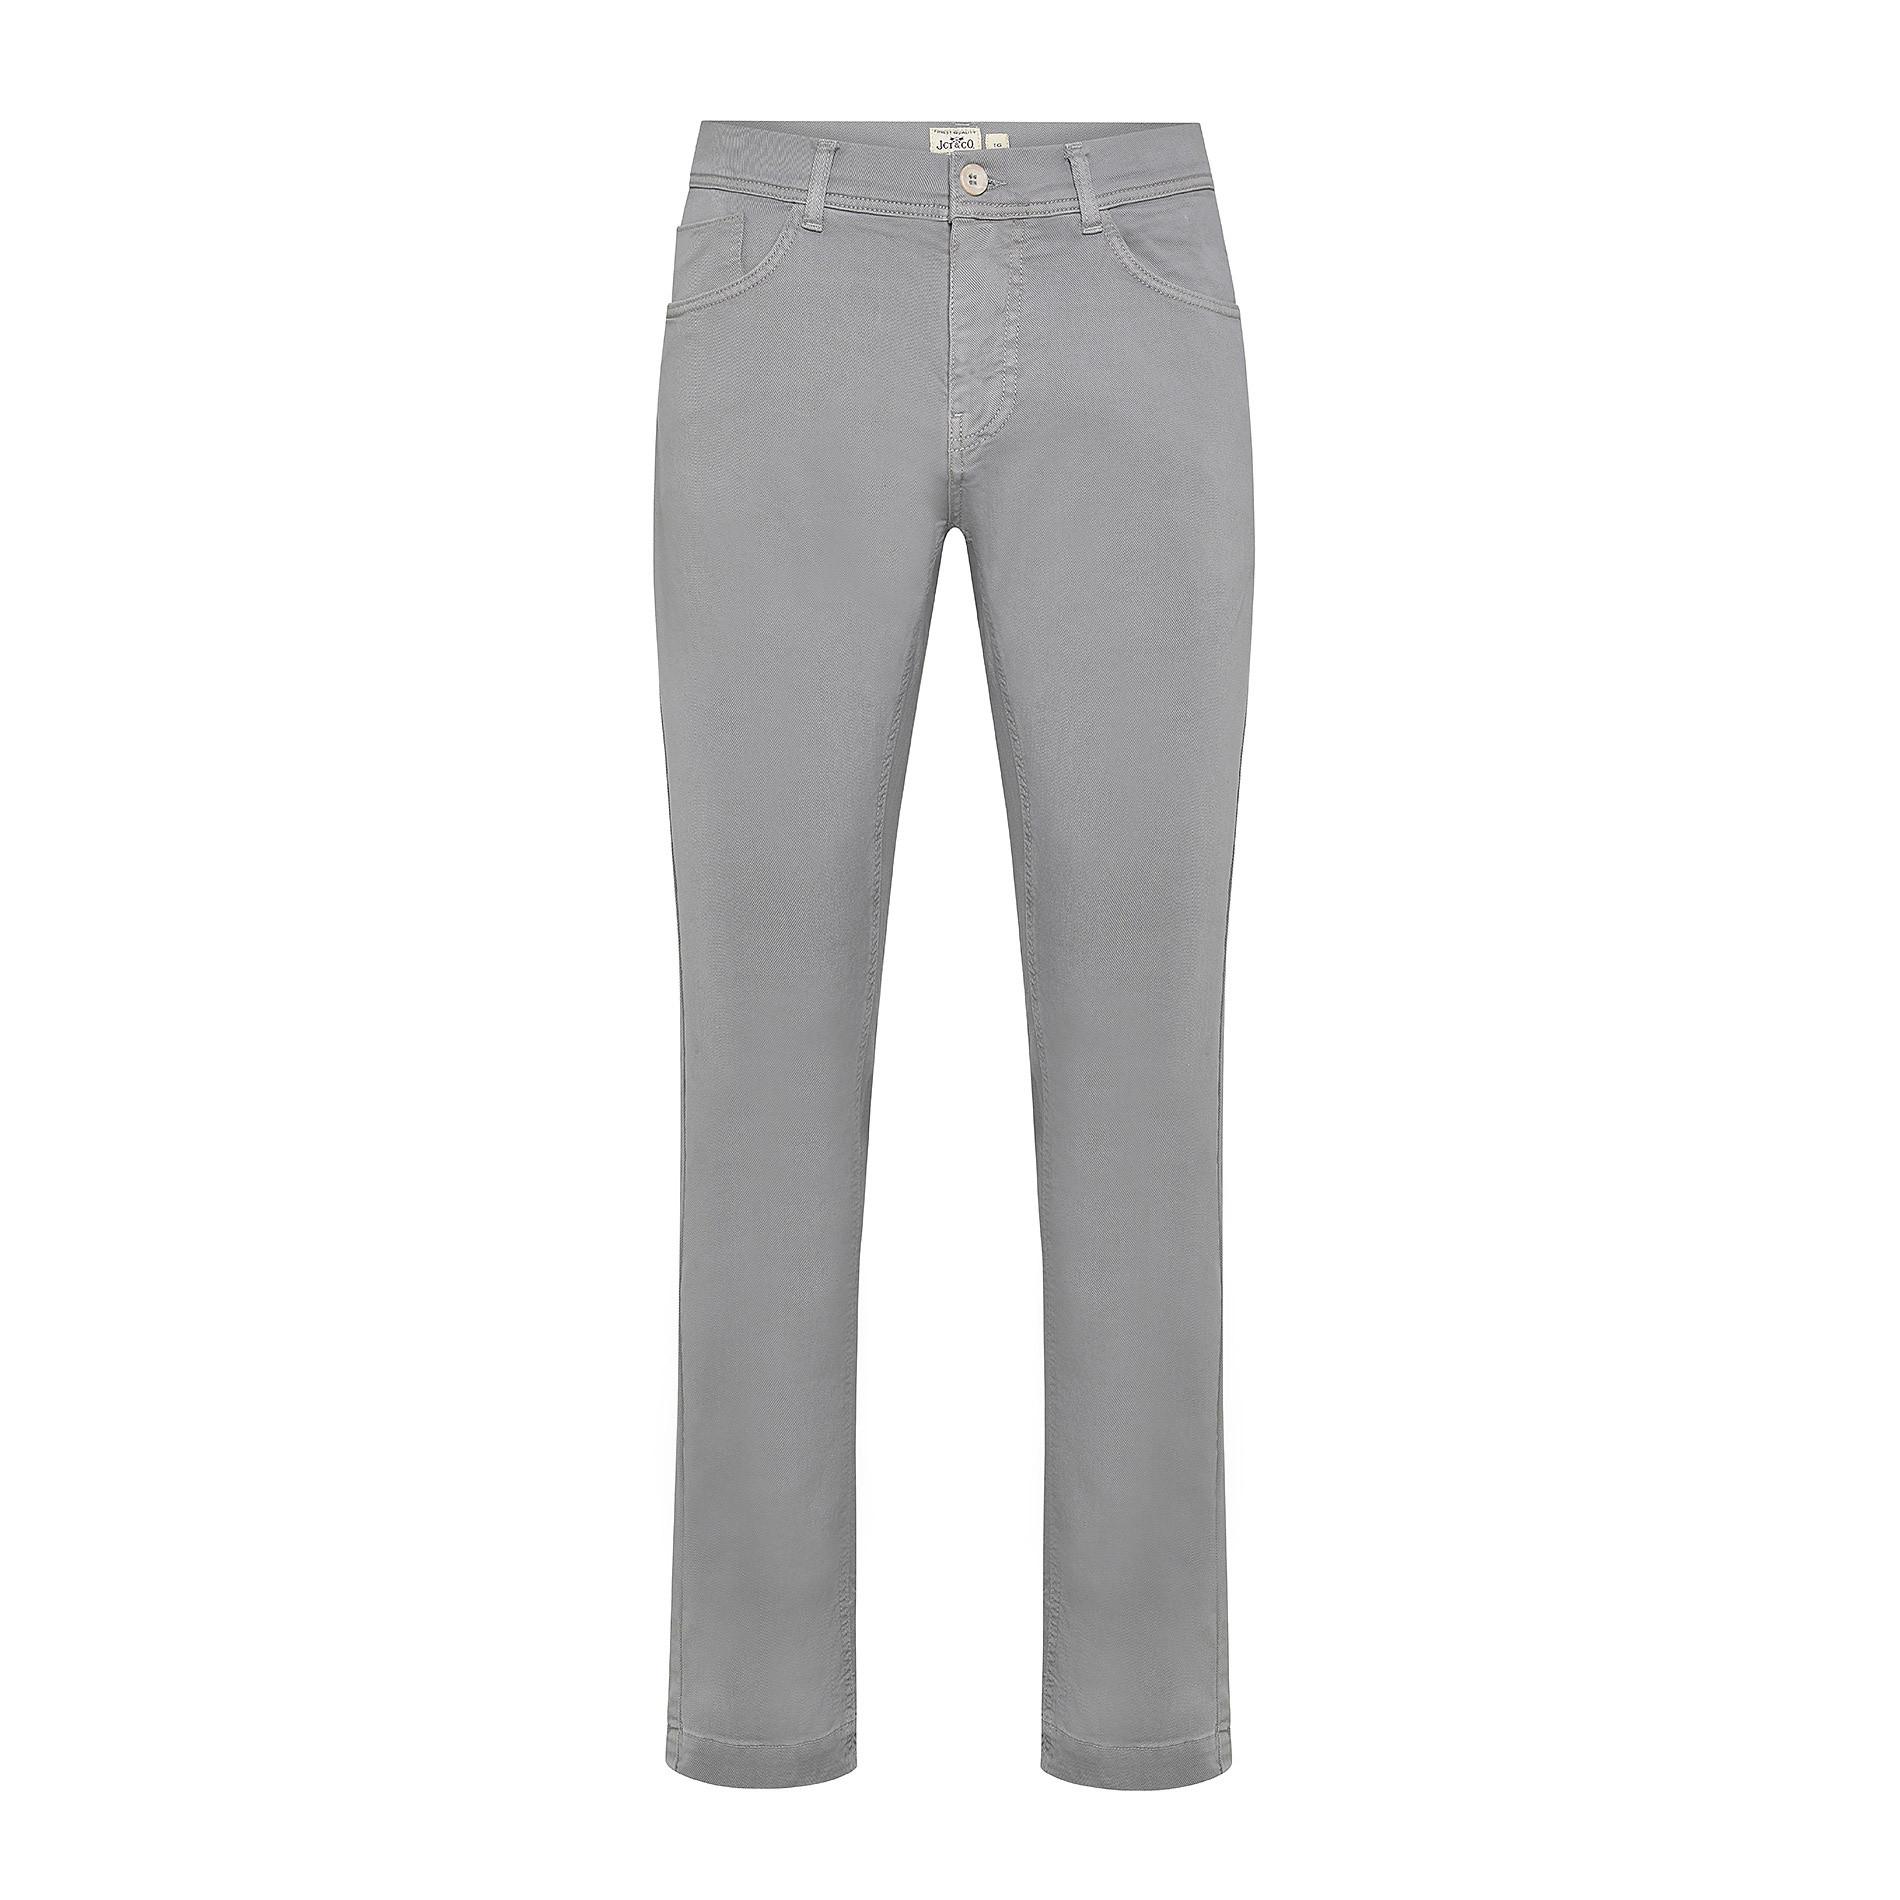 Pantalone cotone stretch 5 tasche JCT, Grigio chiaro, large image number 0